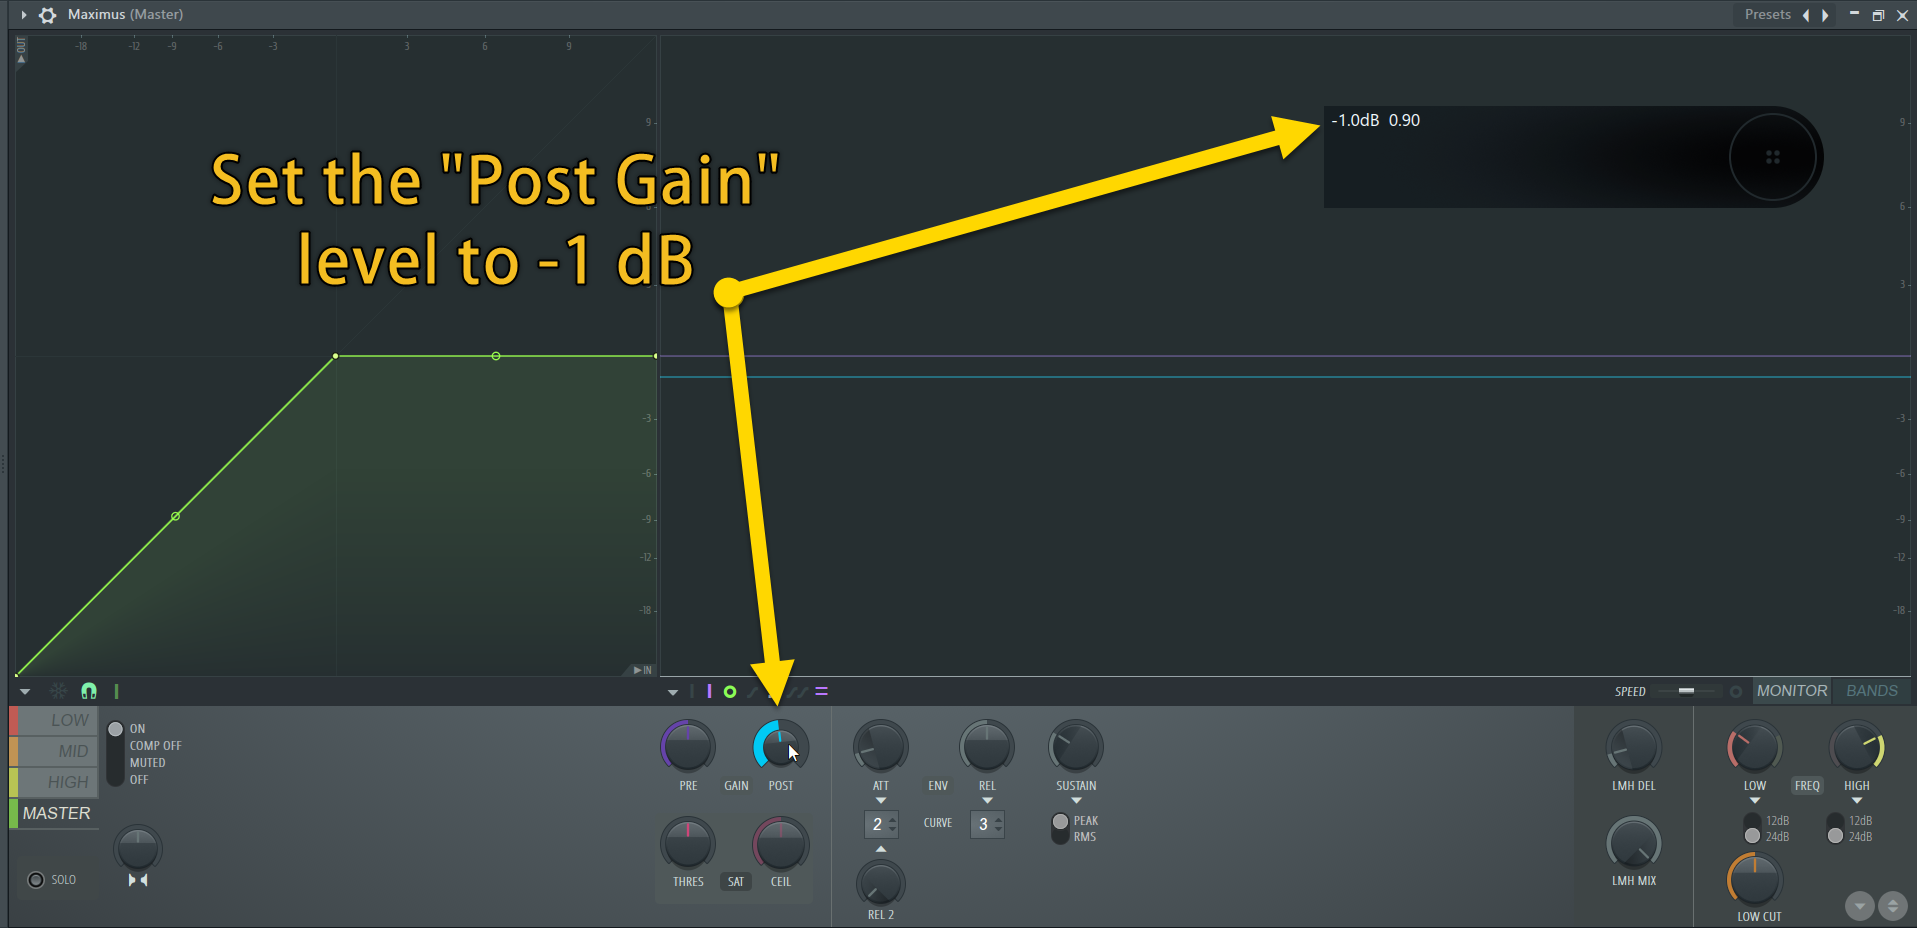 Maximus Post Gain Level -1dB